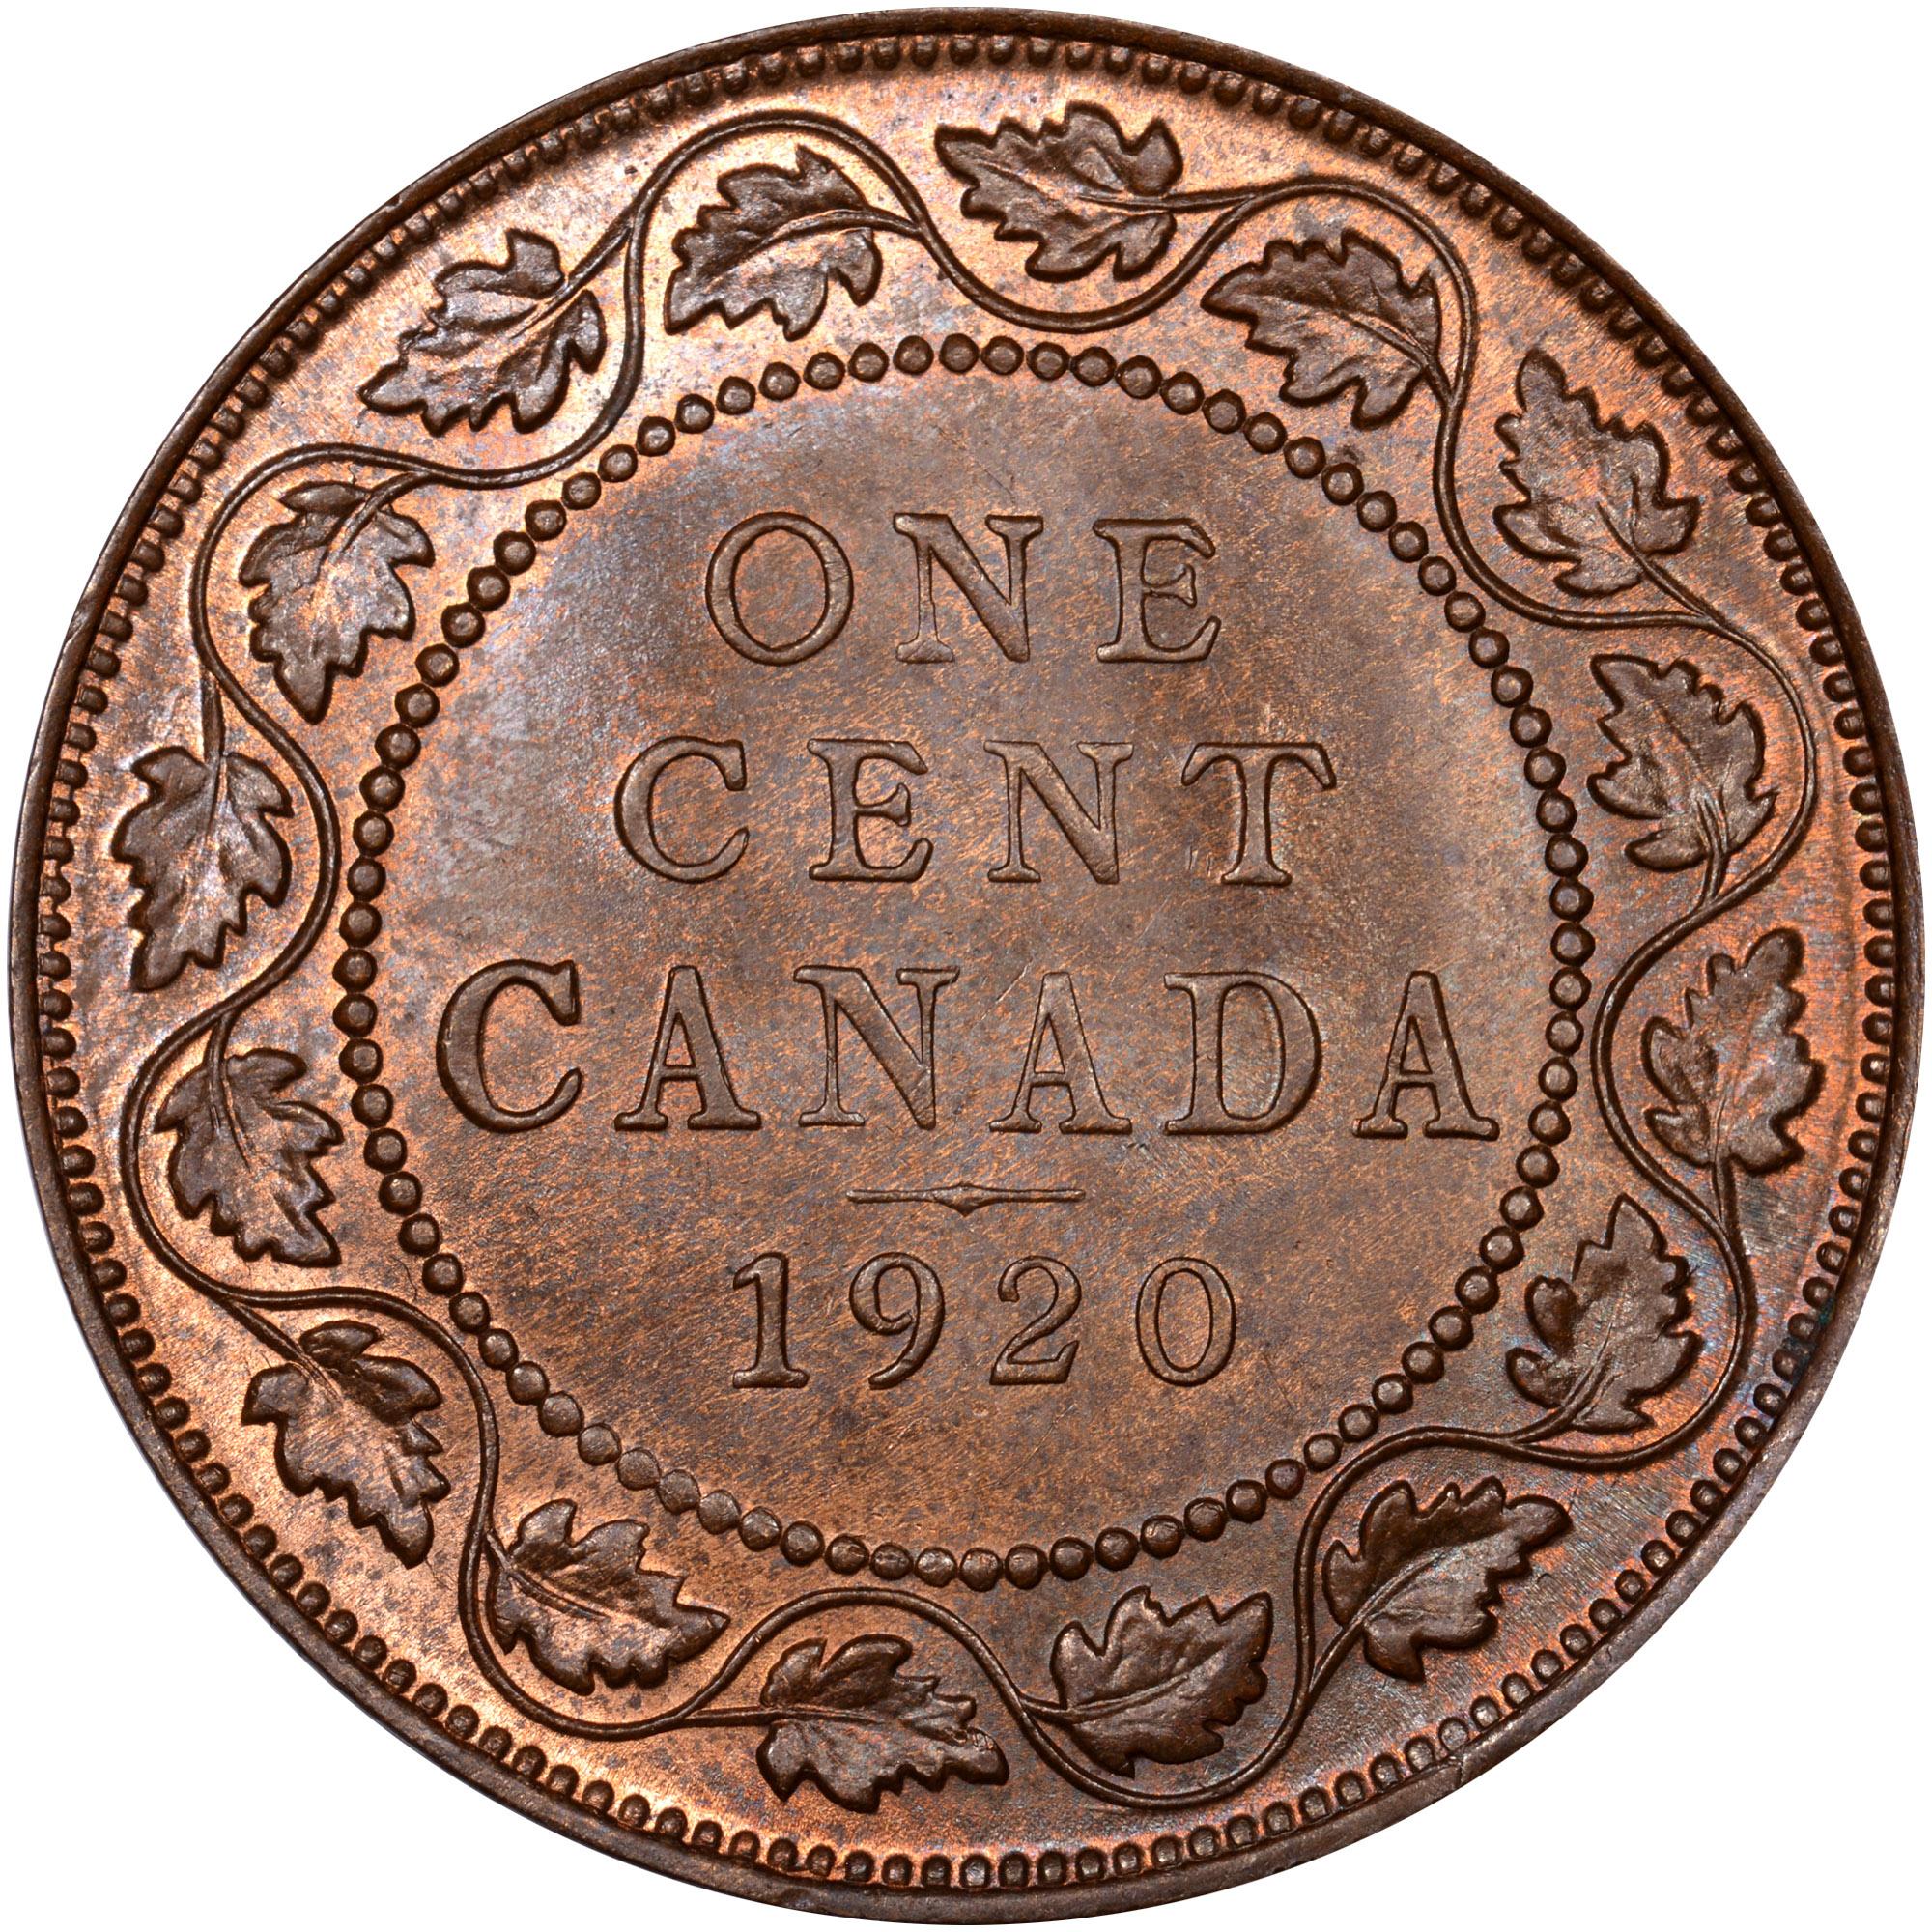 1912-1920 Canada Cent reverse